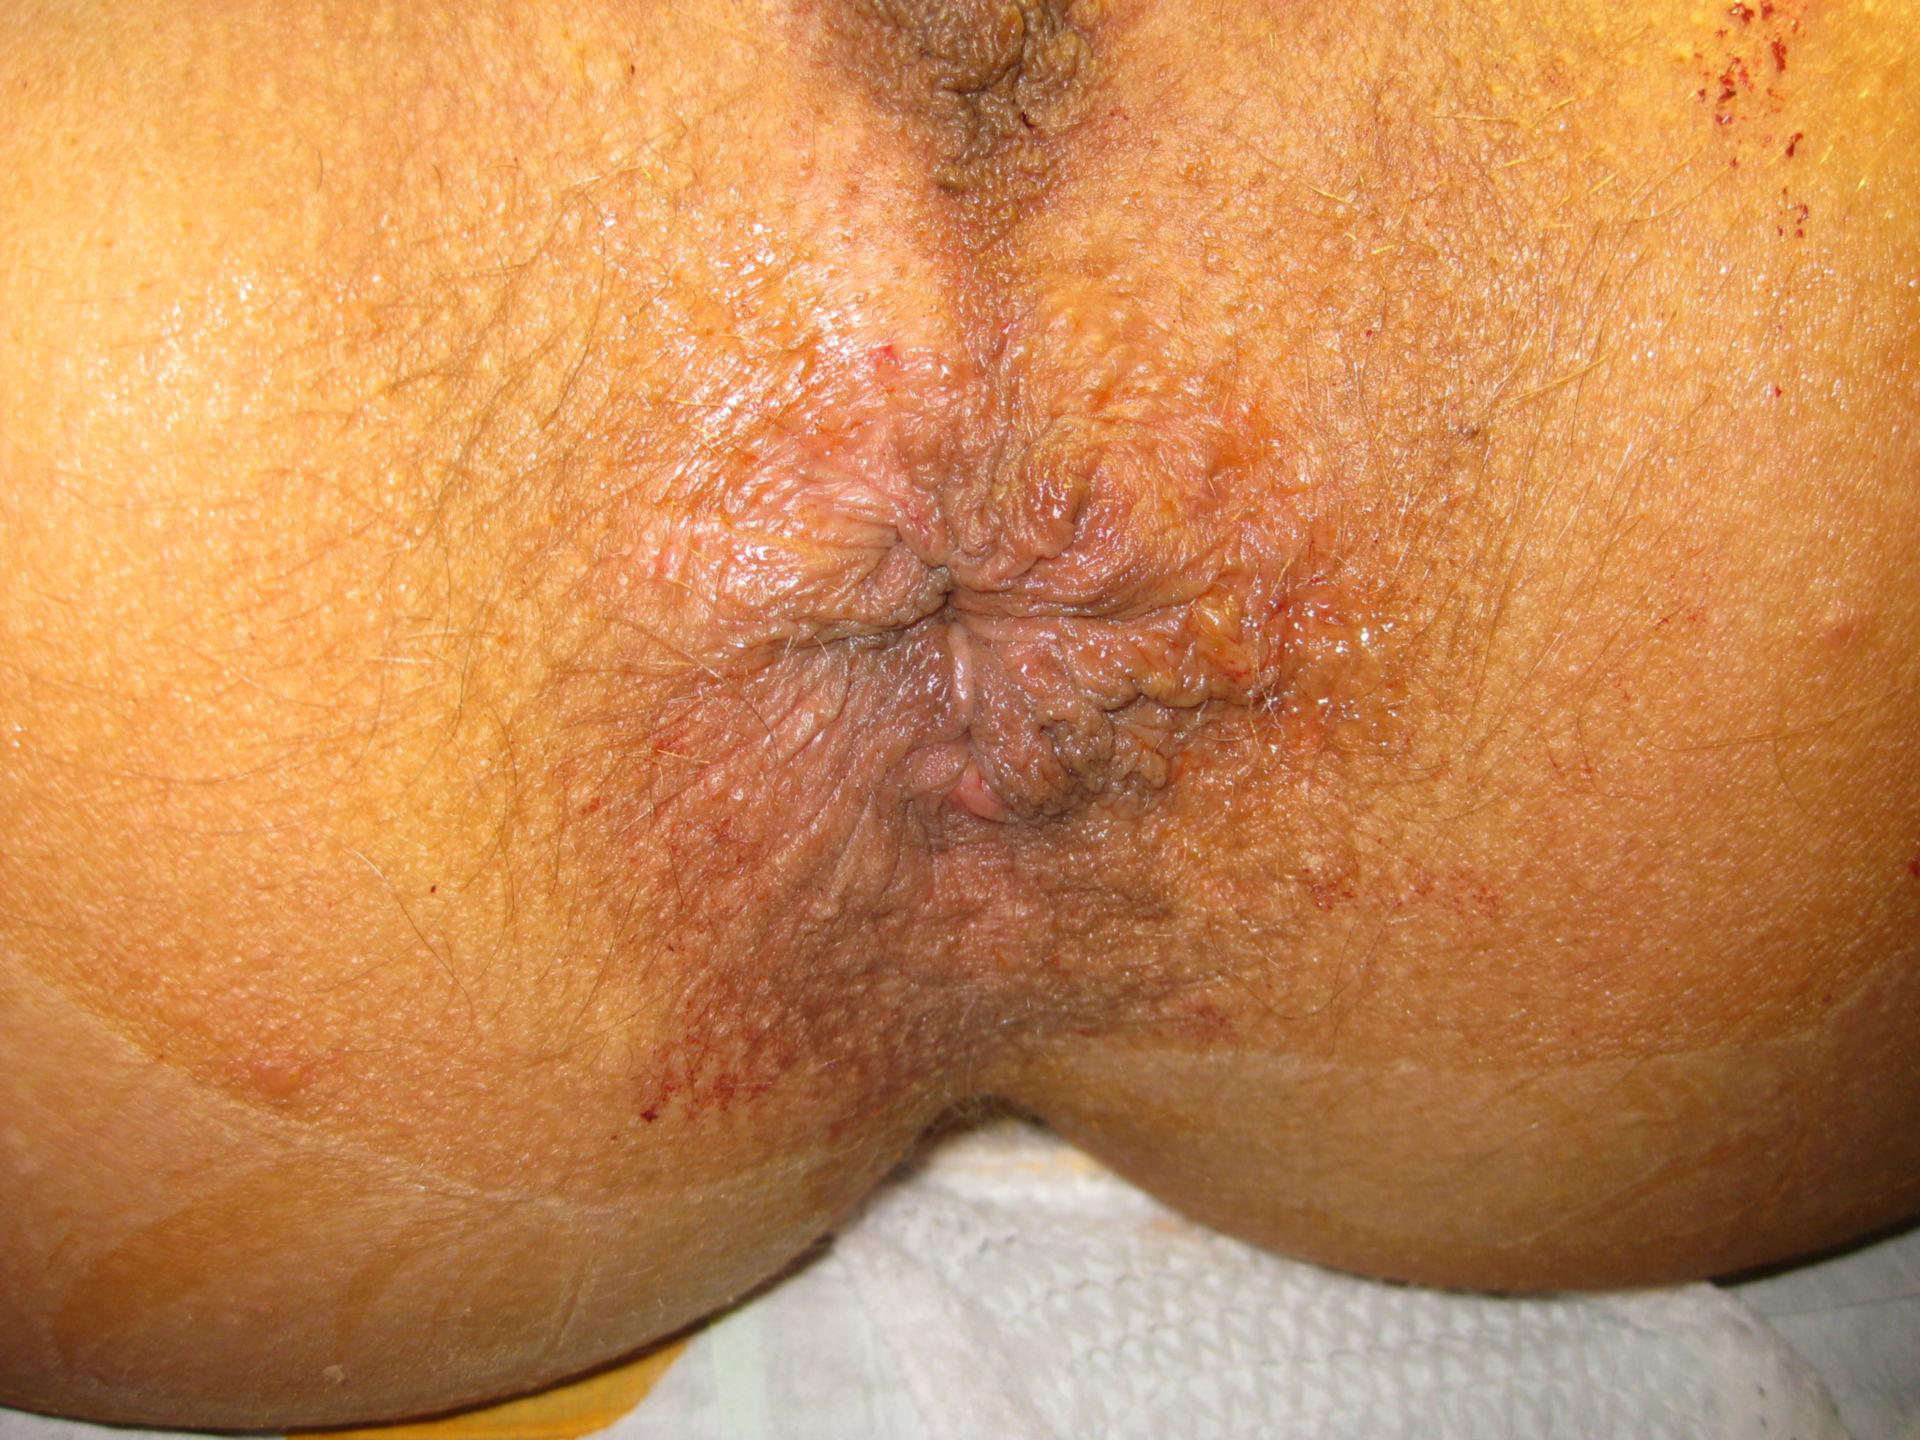 Cirugía de hemorroides, técnica de Longo